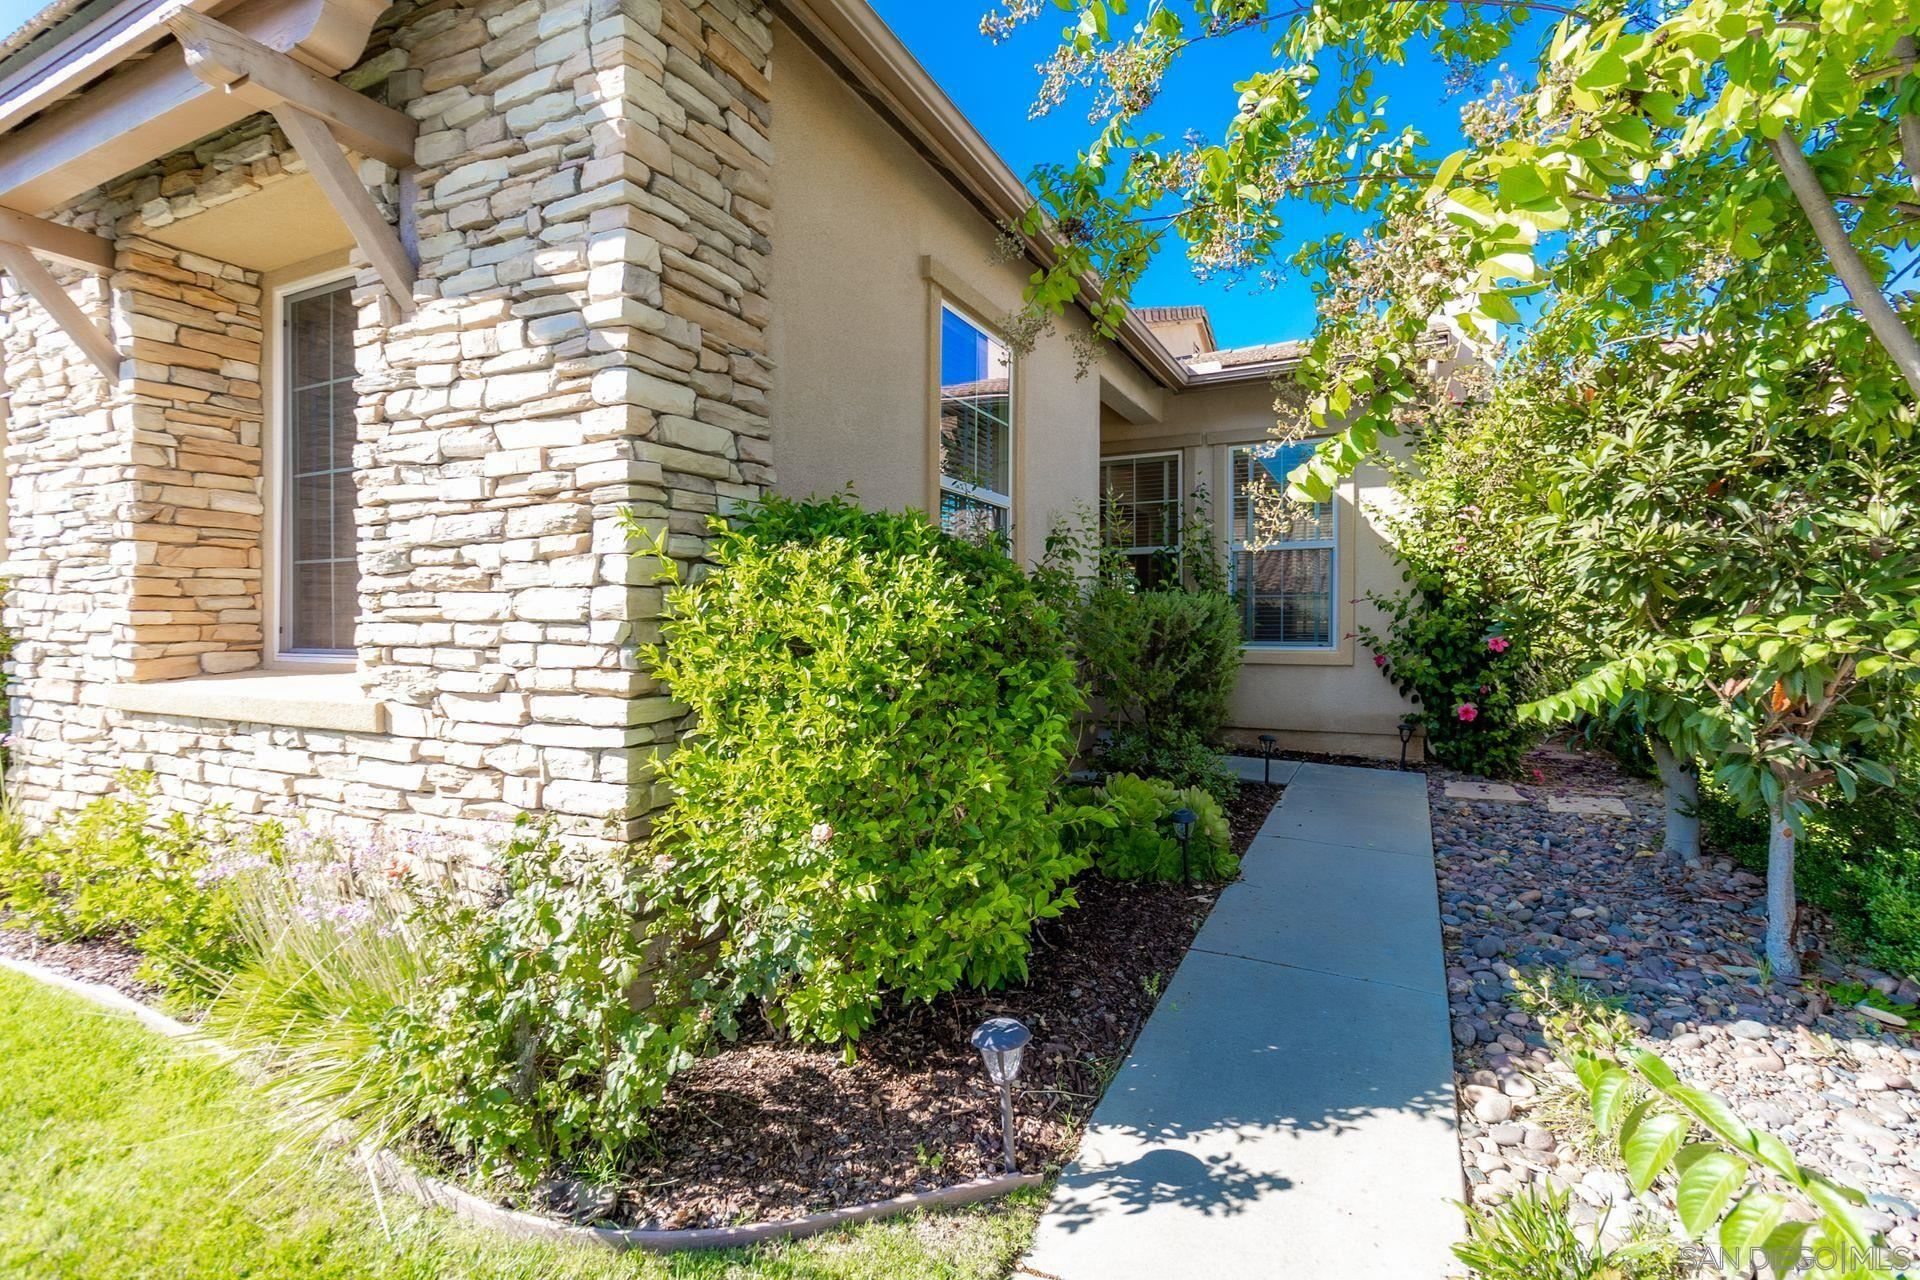 Photo of 27035 Sunningdale Way, Valley Center, CA 92082 (MLS # 210026014)